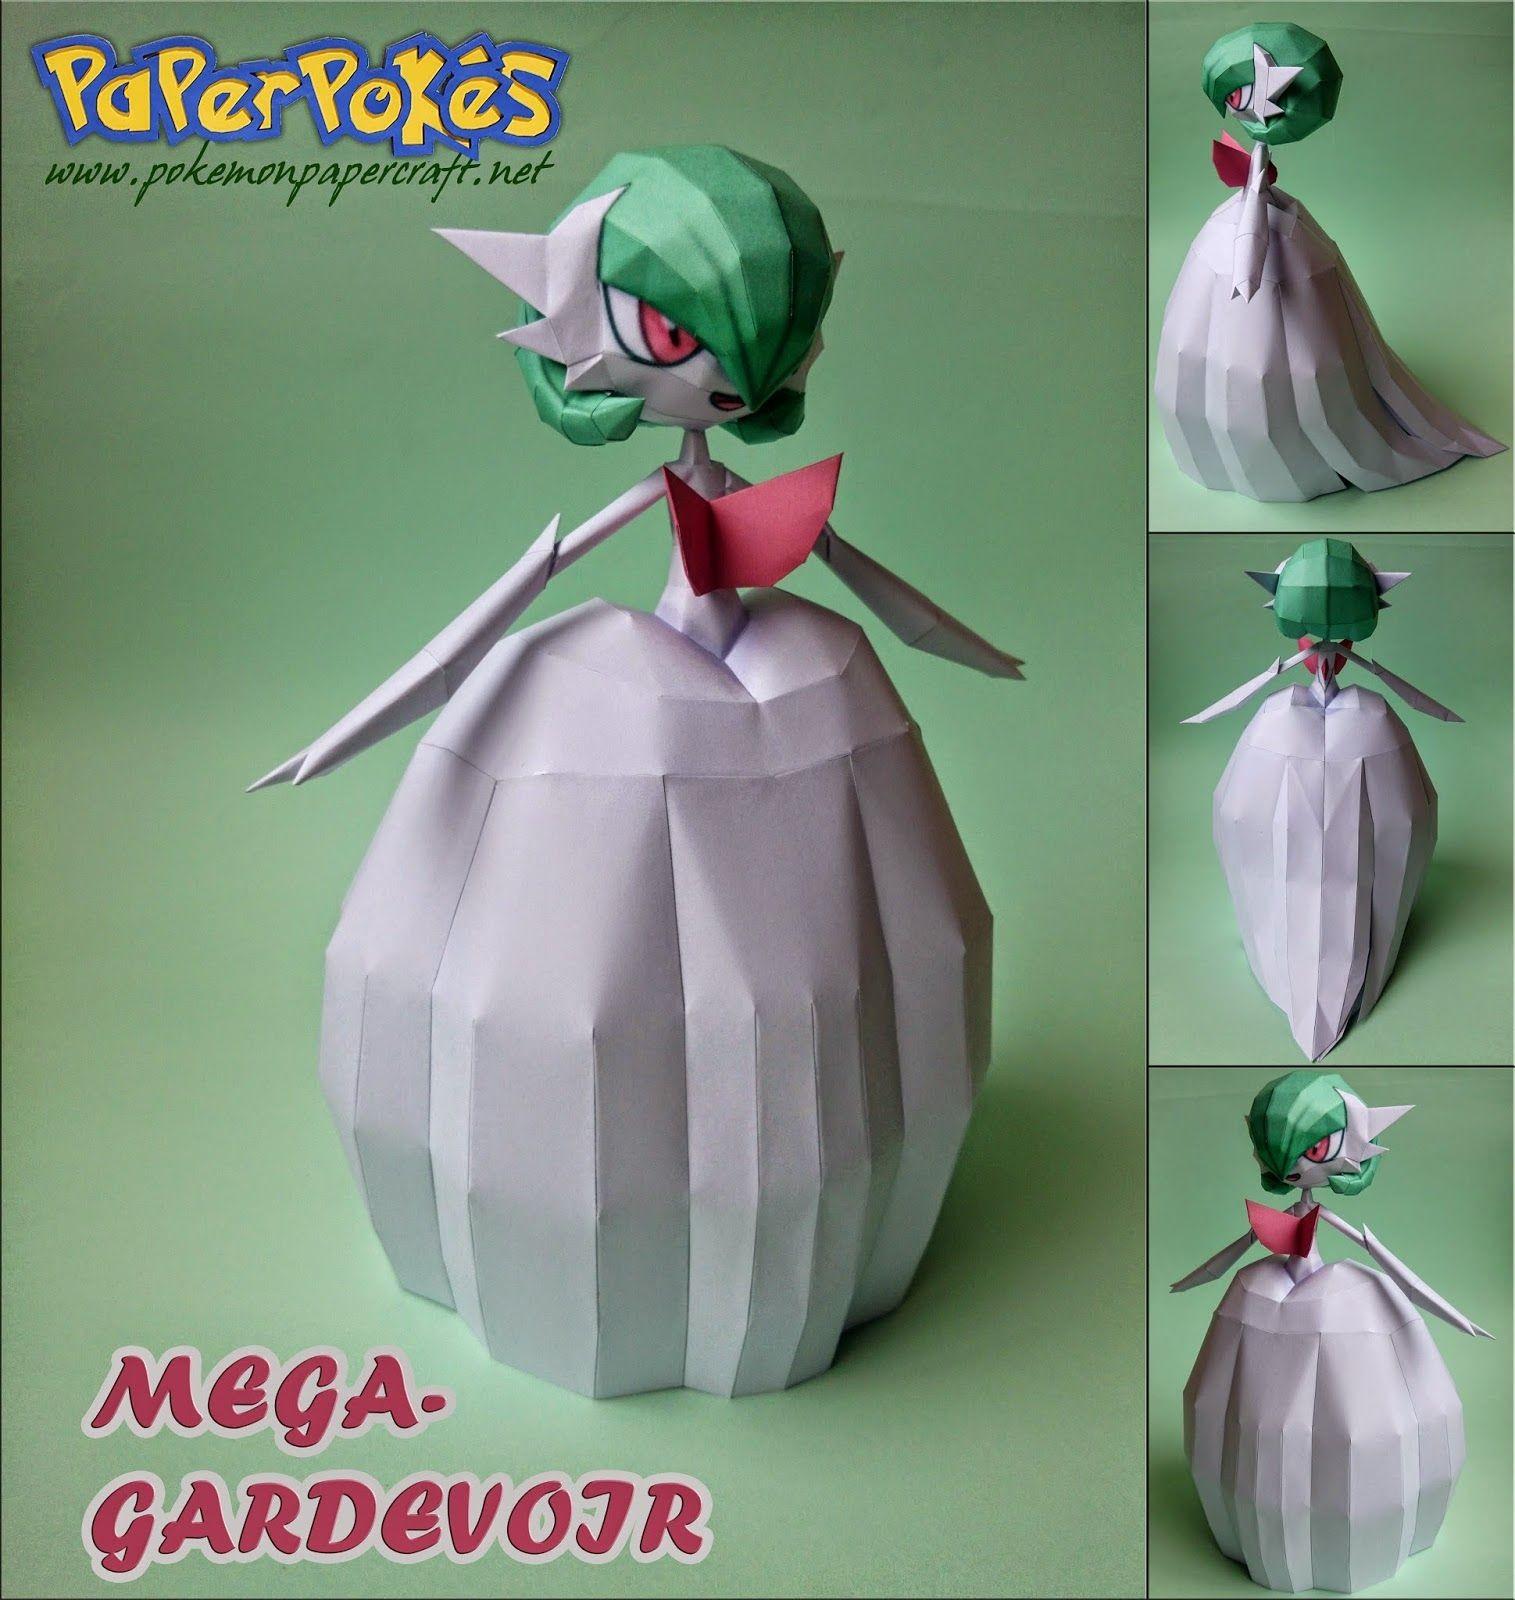 Papercraft Figure Paperpokés Pokémon Papercrafts Mega Gardevoir